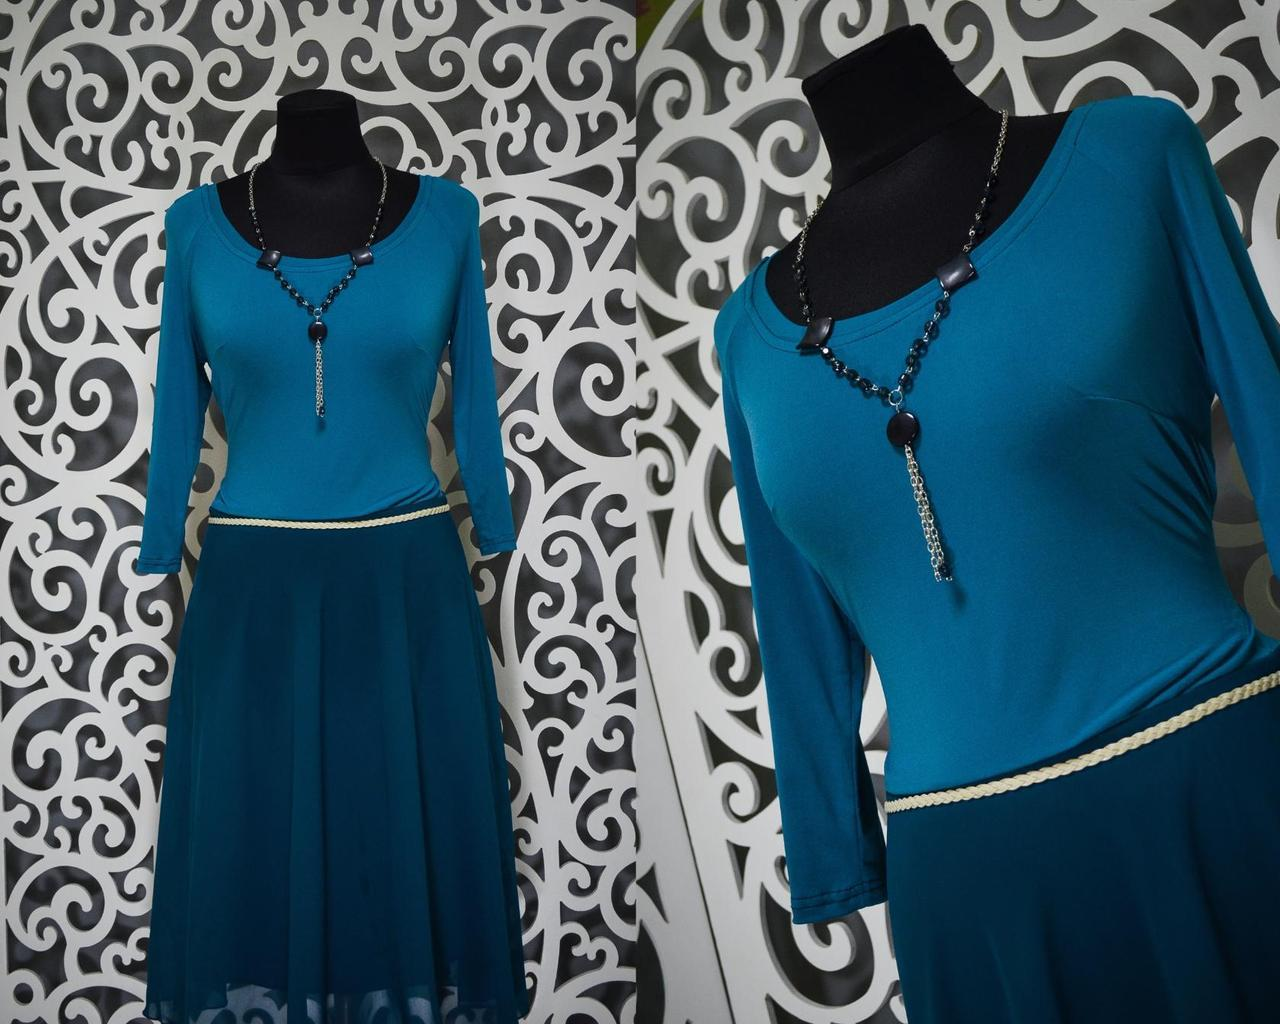 Изысканное женское платье 48, 50, 52, 54 размер баталы